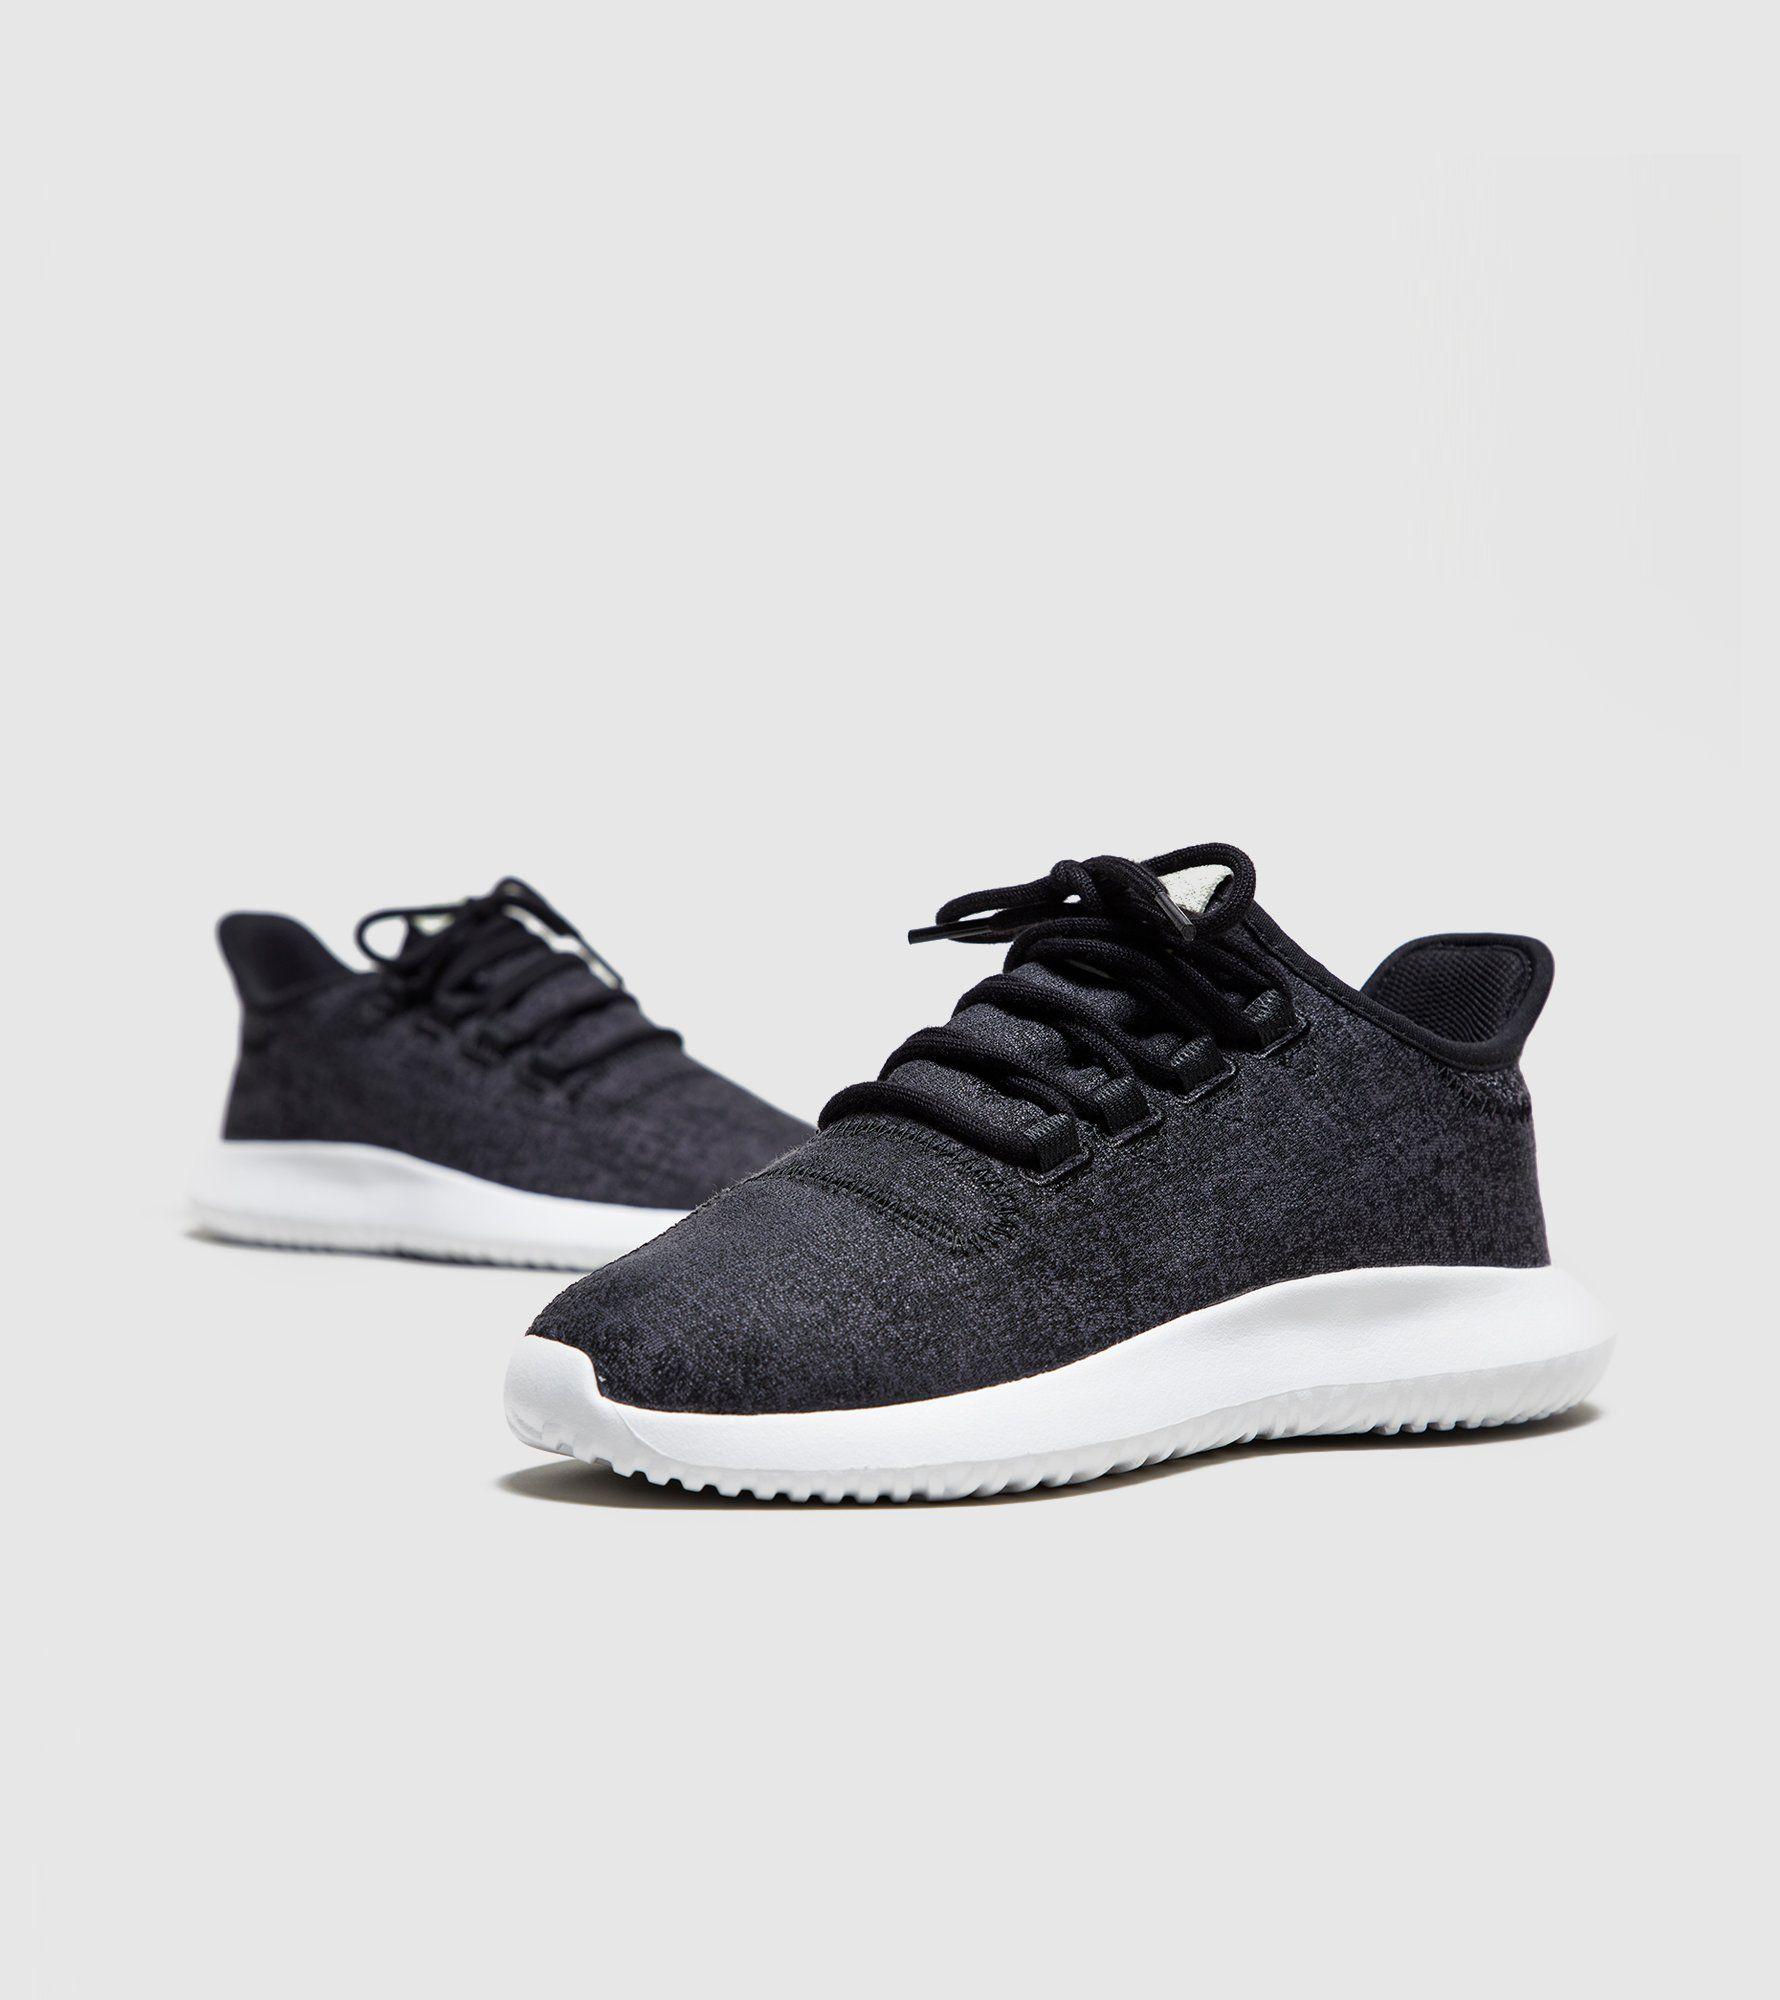 ¿Adidas Originals tubular sombra Lux Femme tamaño?